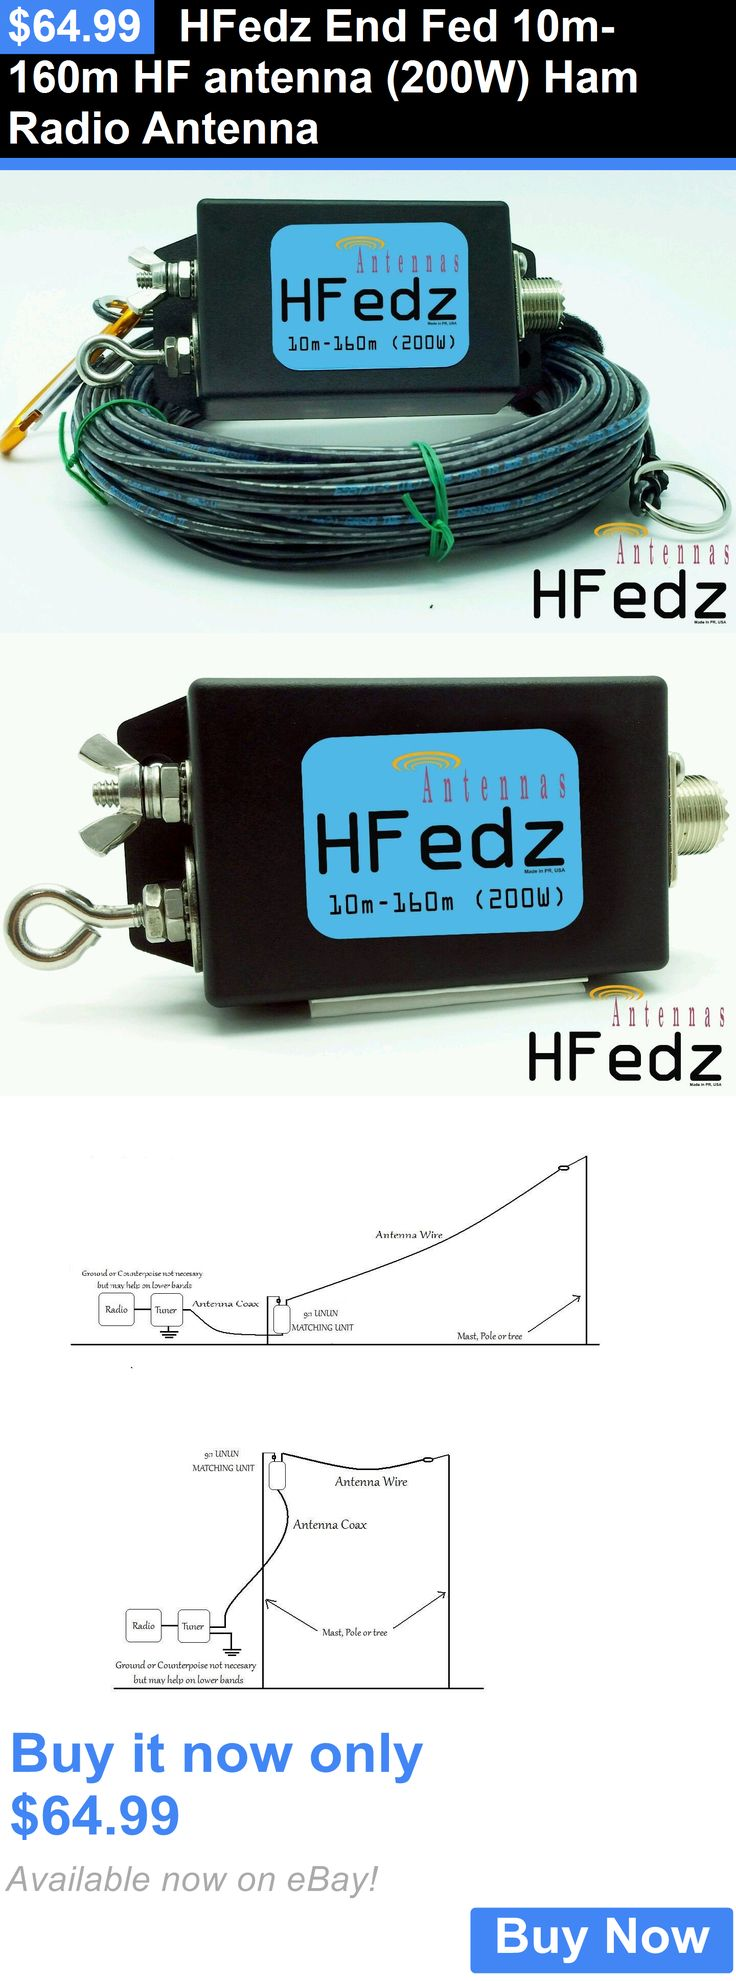 Ham Amateur Radio Antennas: Hfedz End Fed 10M-160M Hf Antenna (200W) Ham Radio Antenna BUY IT NOW ONLY: $64.99